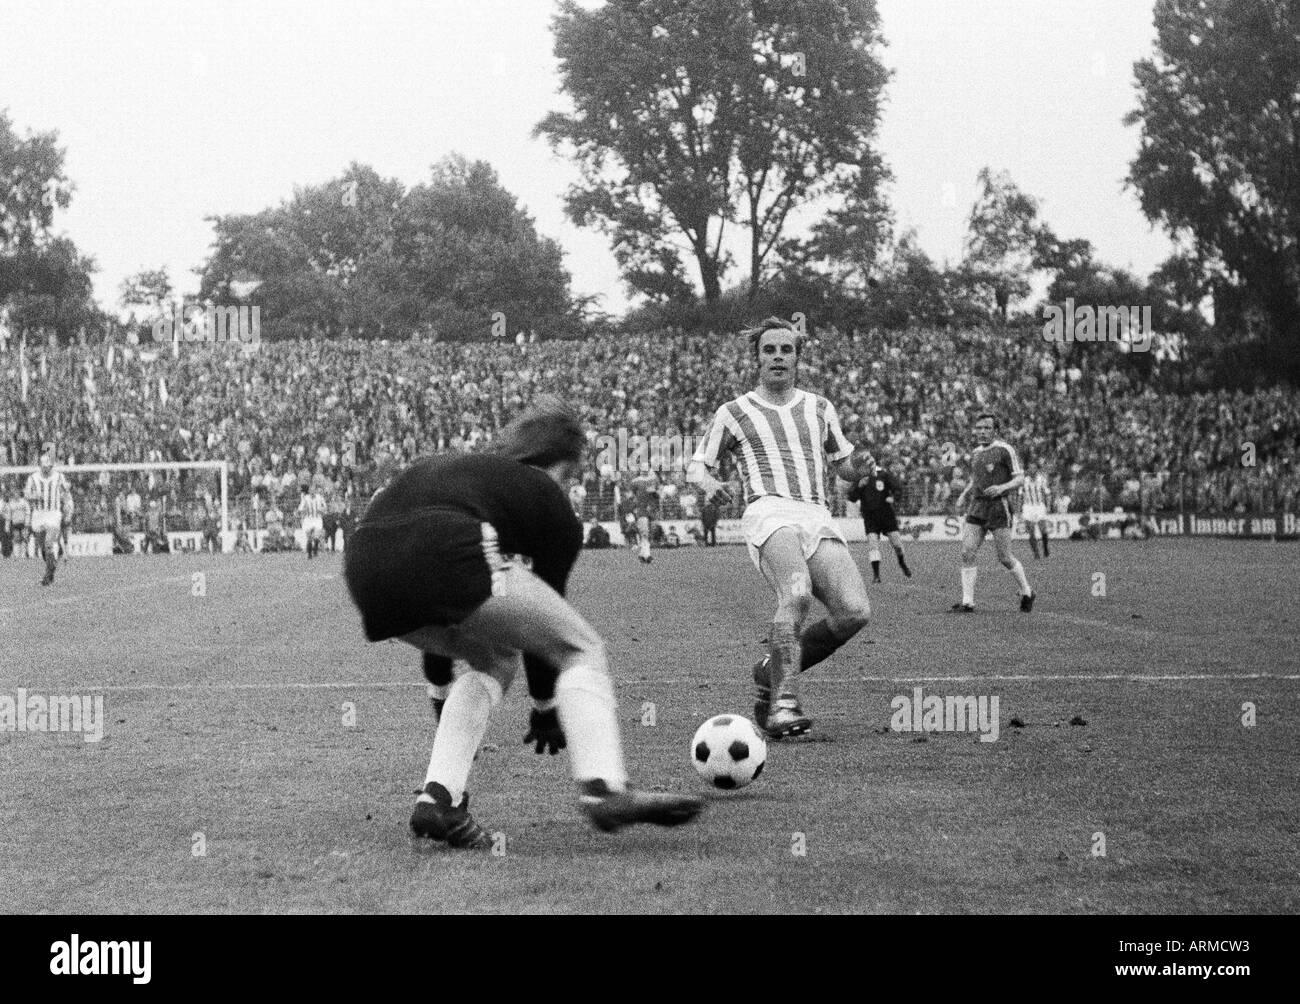 football, Regionalliga 1970/1971, promotion match to the Bundesliga 1971/1972, VfL Bochum versus VfL Osnabrueck 3:1, Stadium an der Castroper Strasse in Bochum, scene of the match, f.l.t.r. keeper Hans Juergen Bradler (Bochum), Carsten Baumann (Osnabrueck - Stock Image